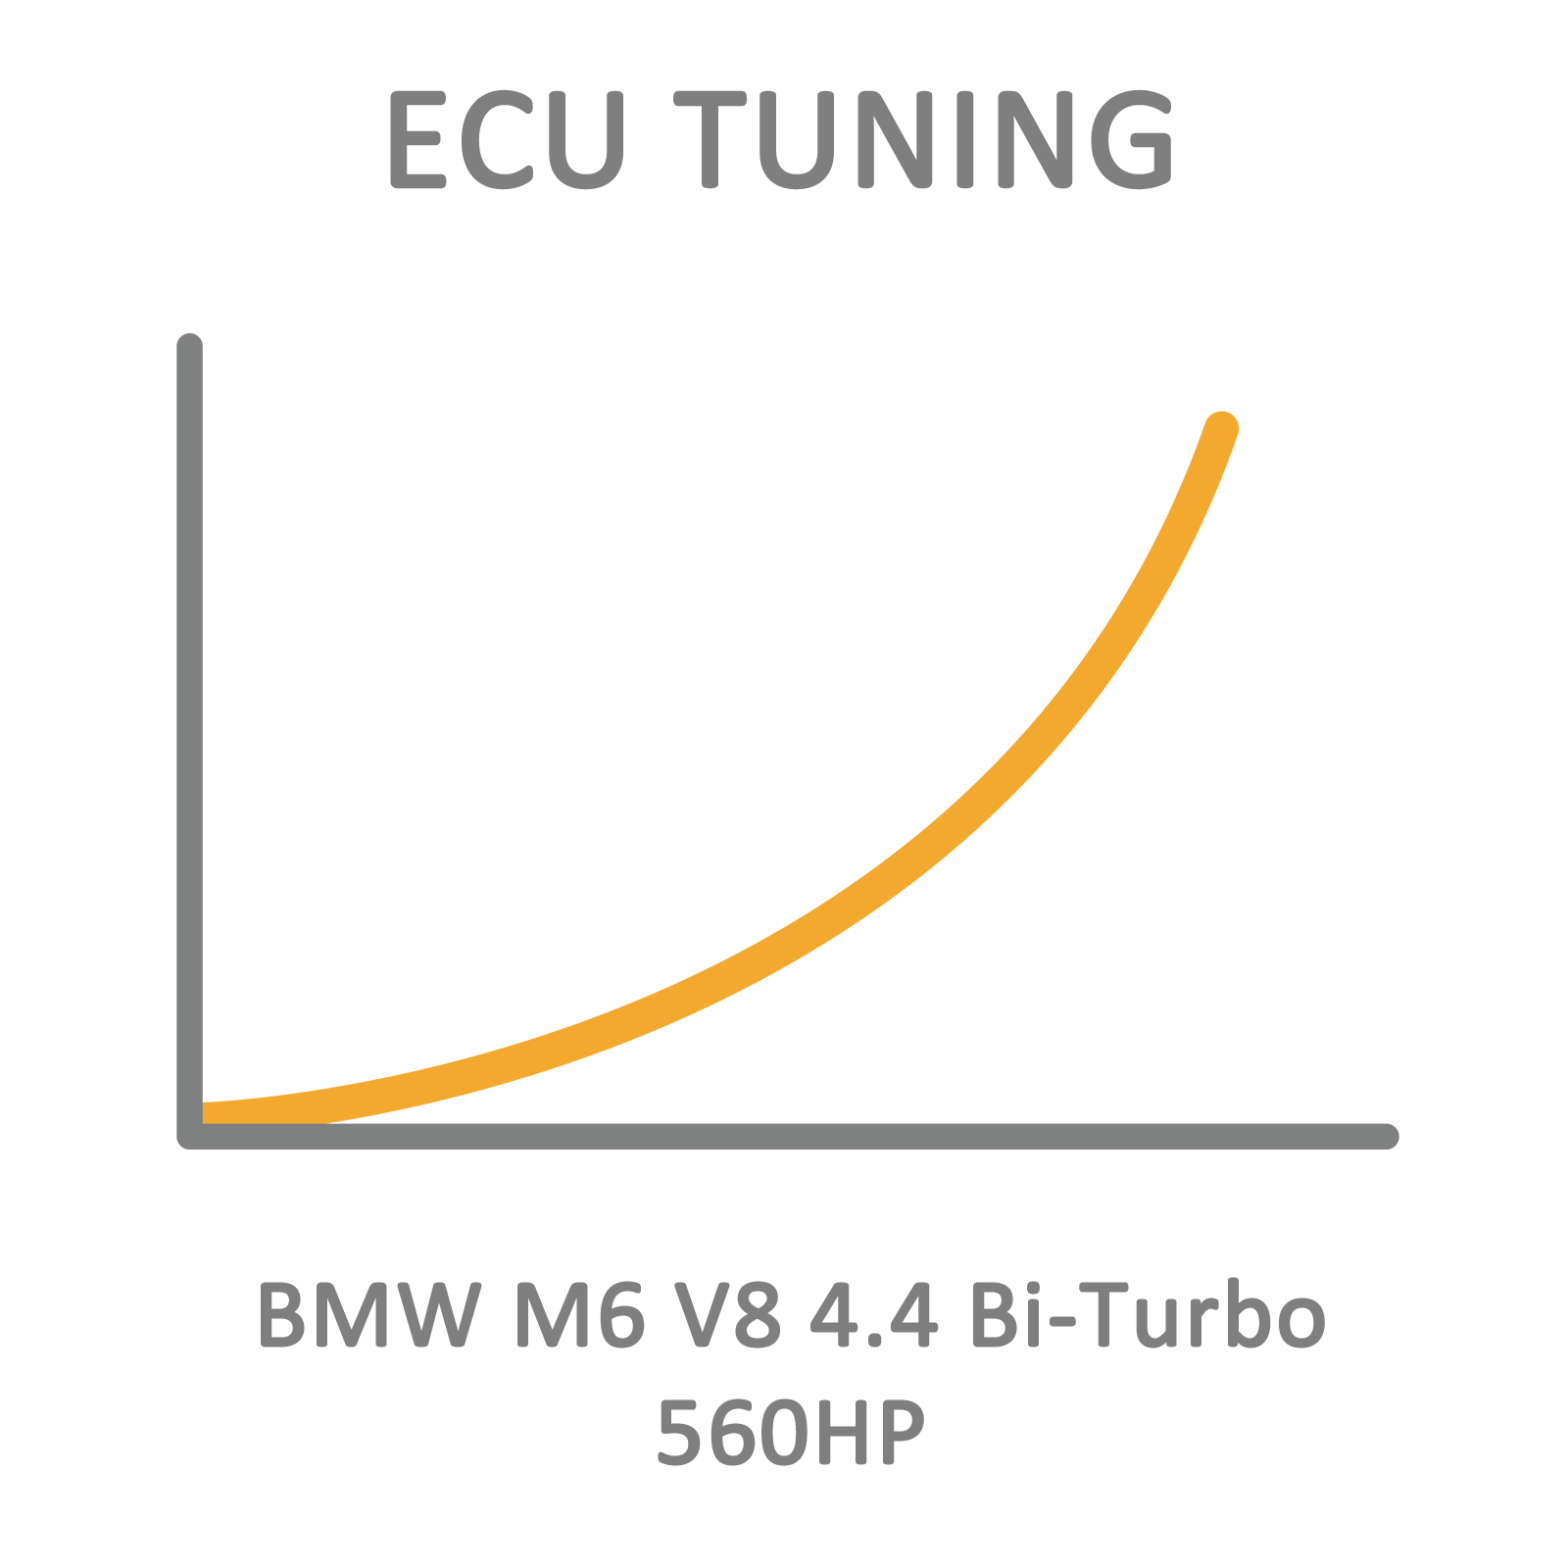 BMW M6 V8 4.4 Bi-Turbo 560HP ECU Tuning Remapping Programming